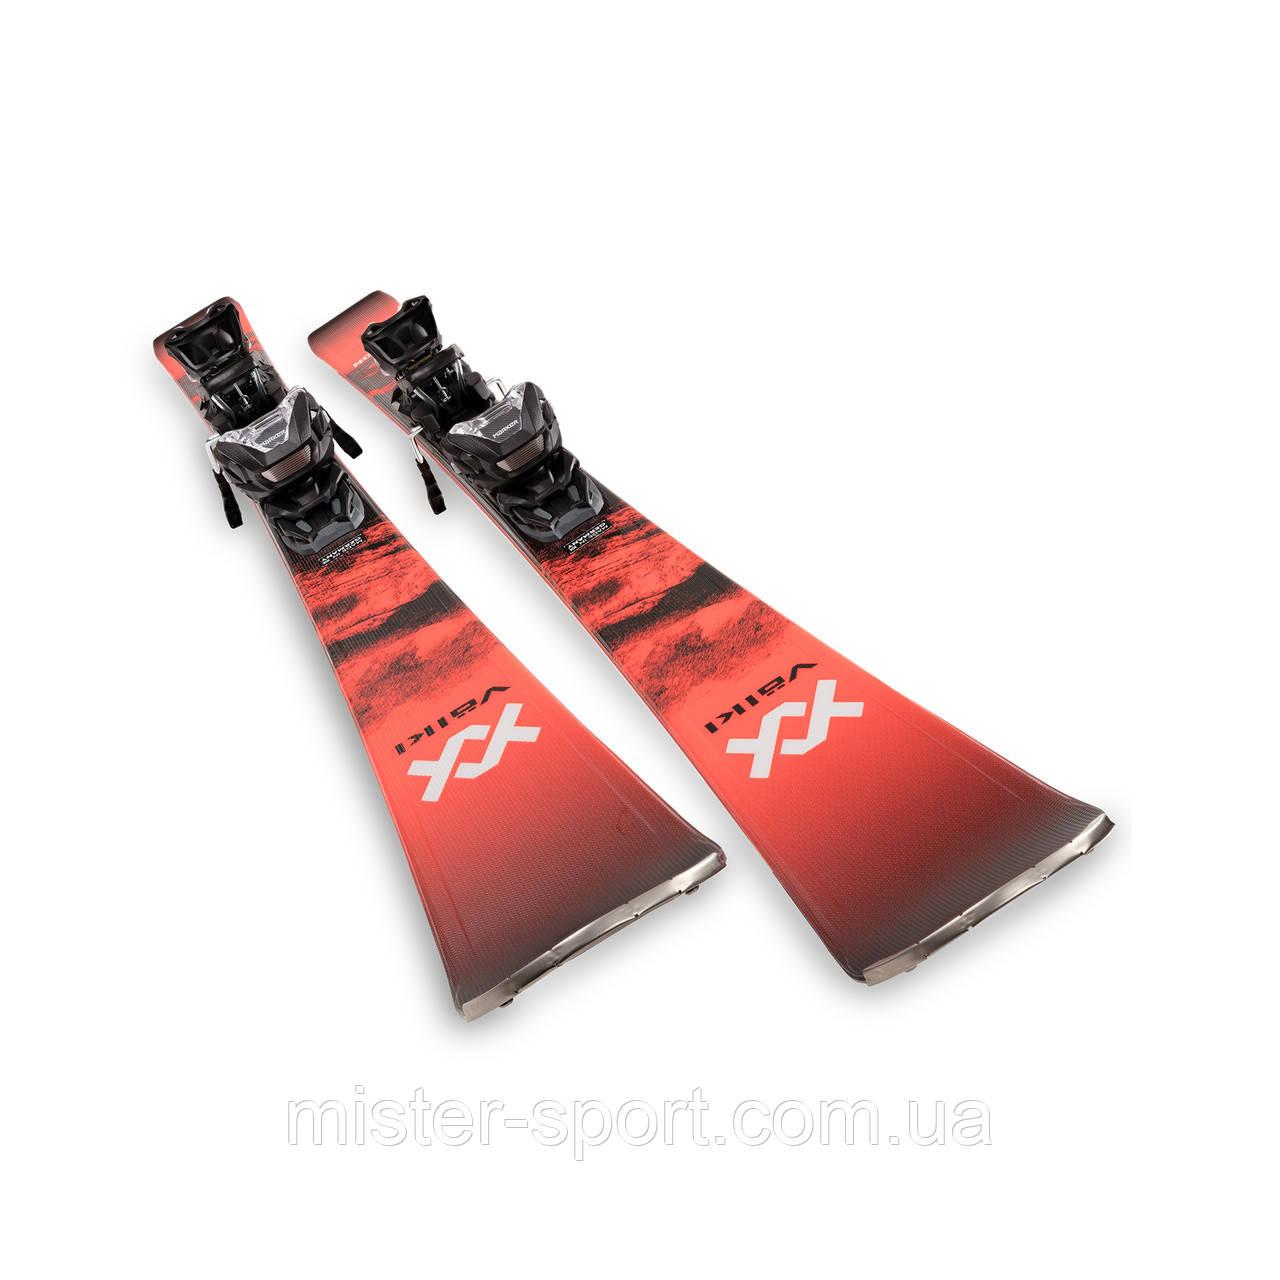 Лыжи VOLKL Deacon 75 + кр VMotion 12 GW 2021